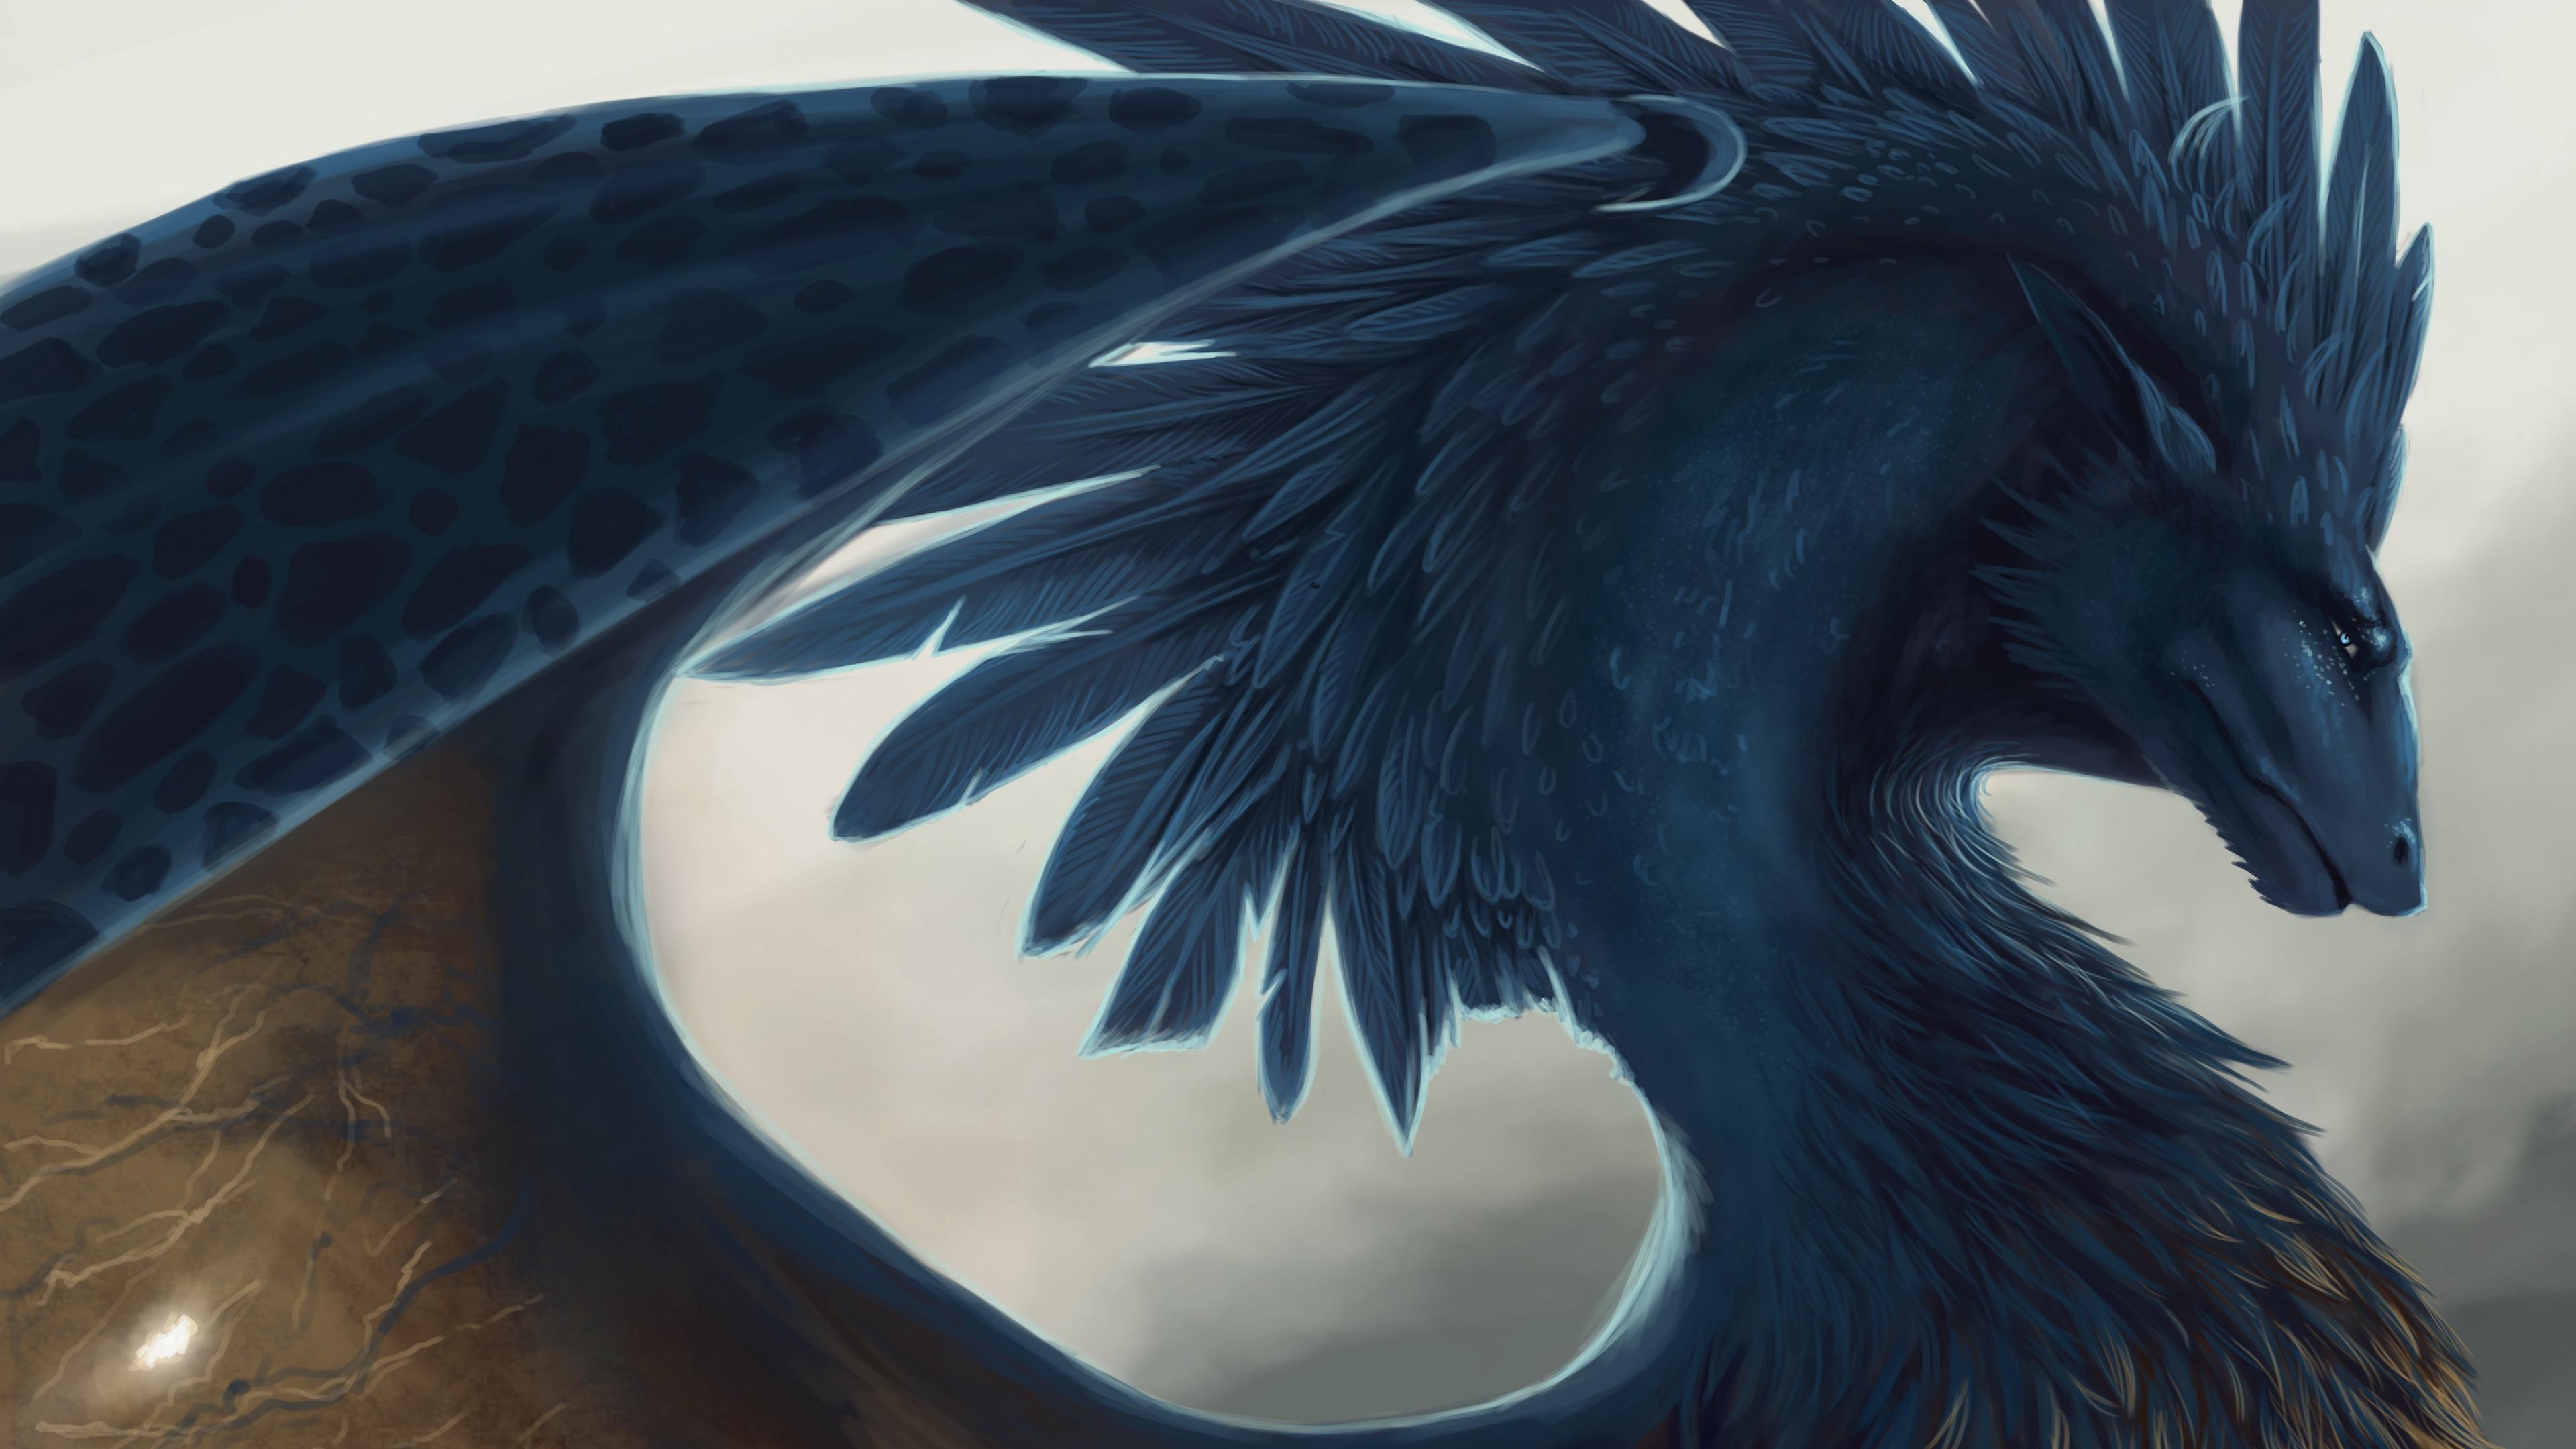 Download wallpaper 3840x2160 dragon fantasy art feathers 4k uhd 3840x2160